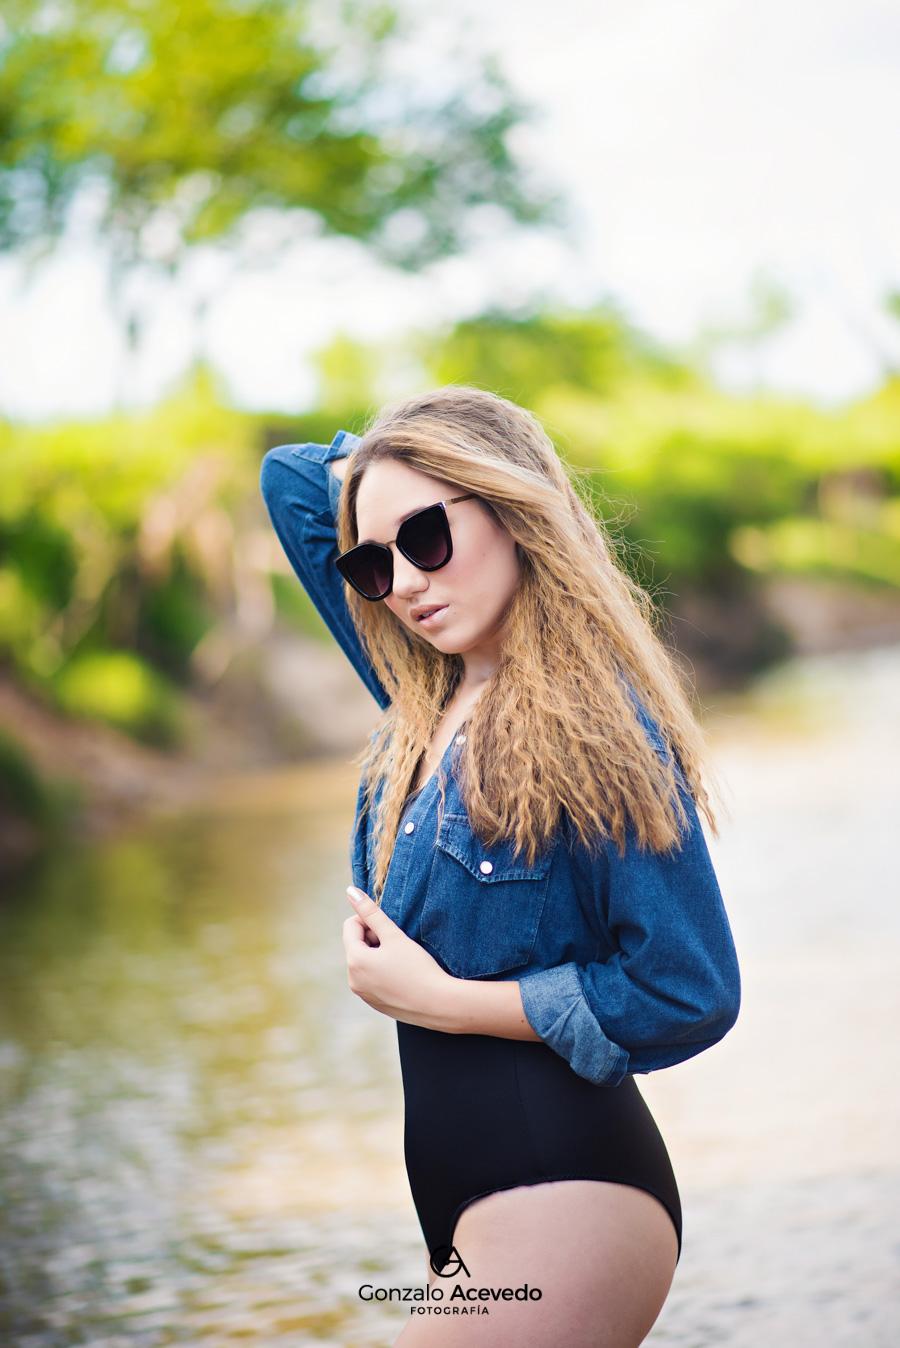 Vale book 15 look outfit playa arena rio agua verano calor ideas geniales #gonzaloacevedofotografia gonzalo acevedo gri becker